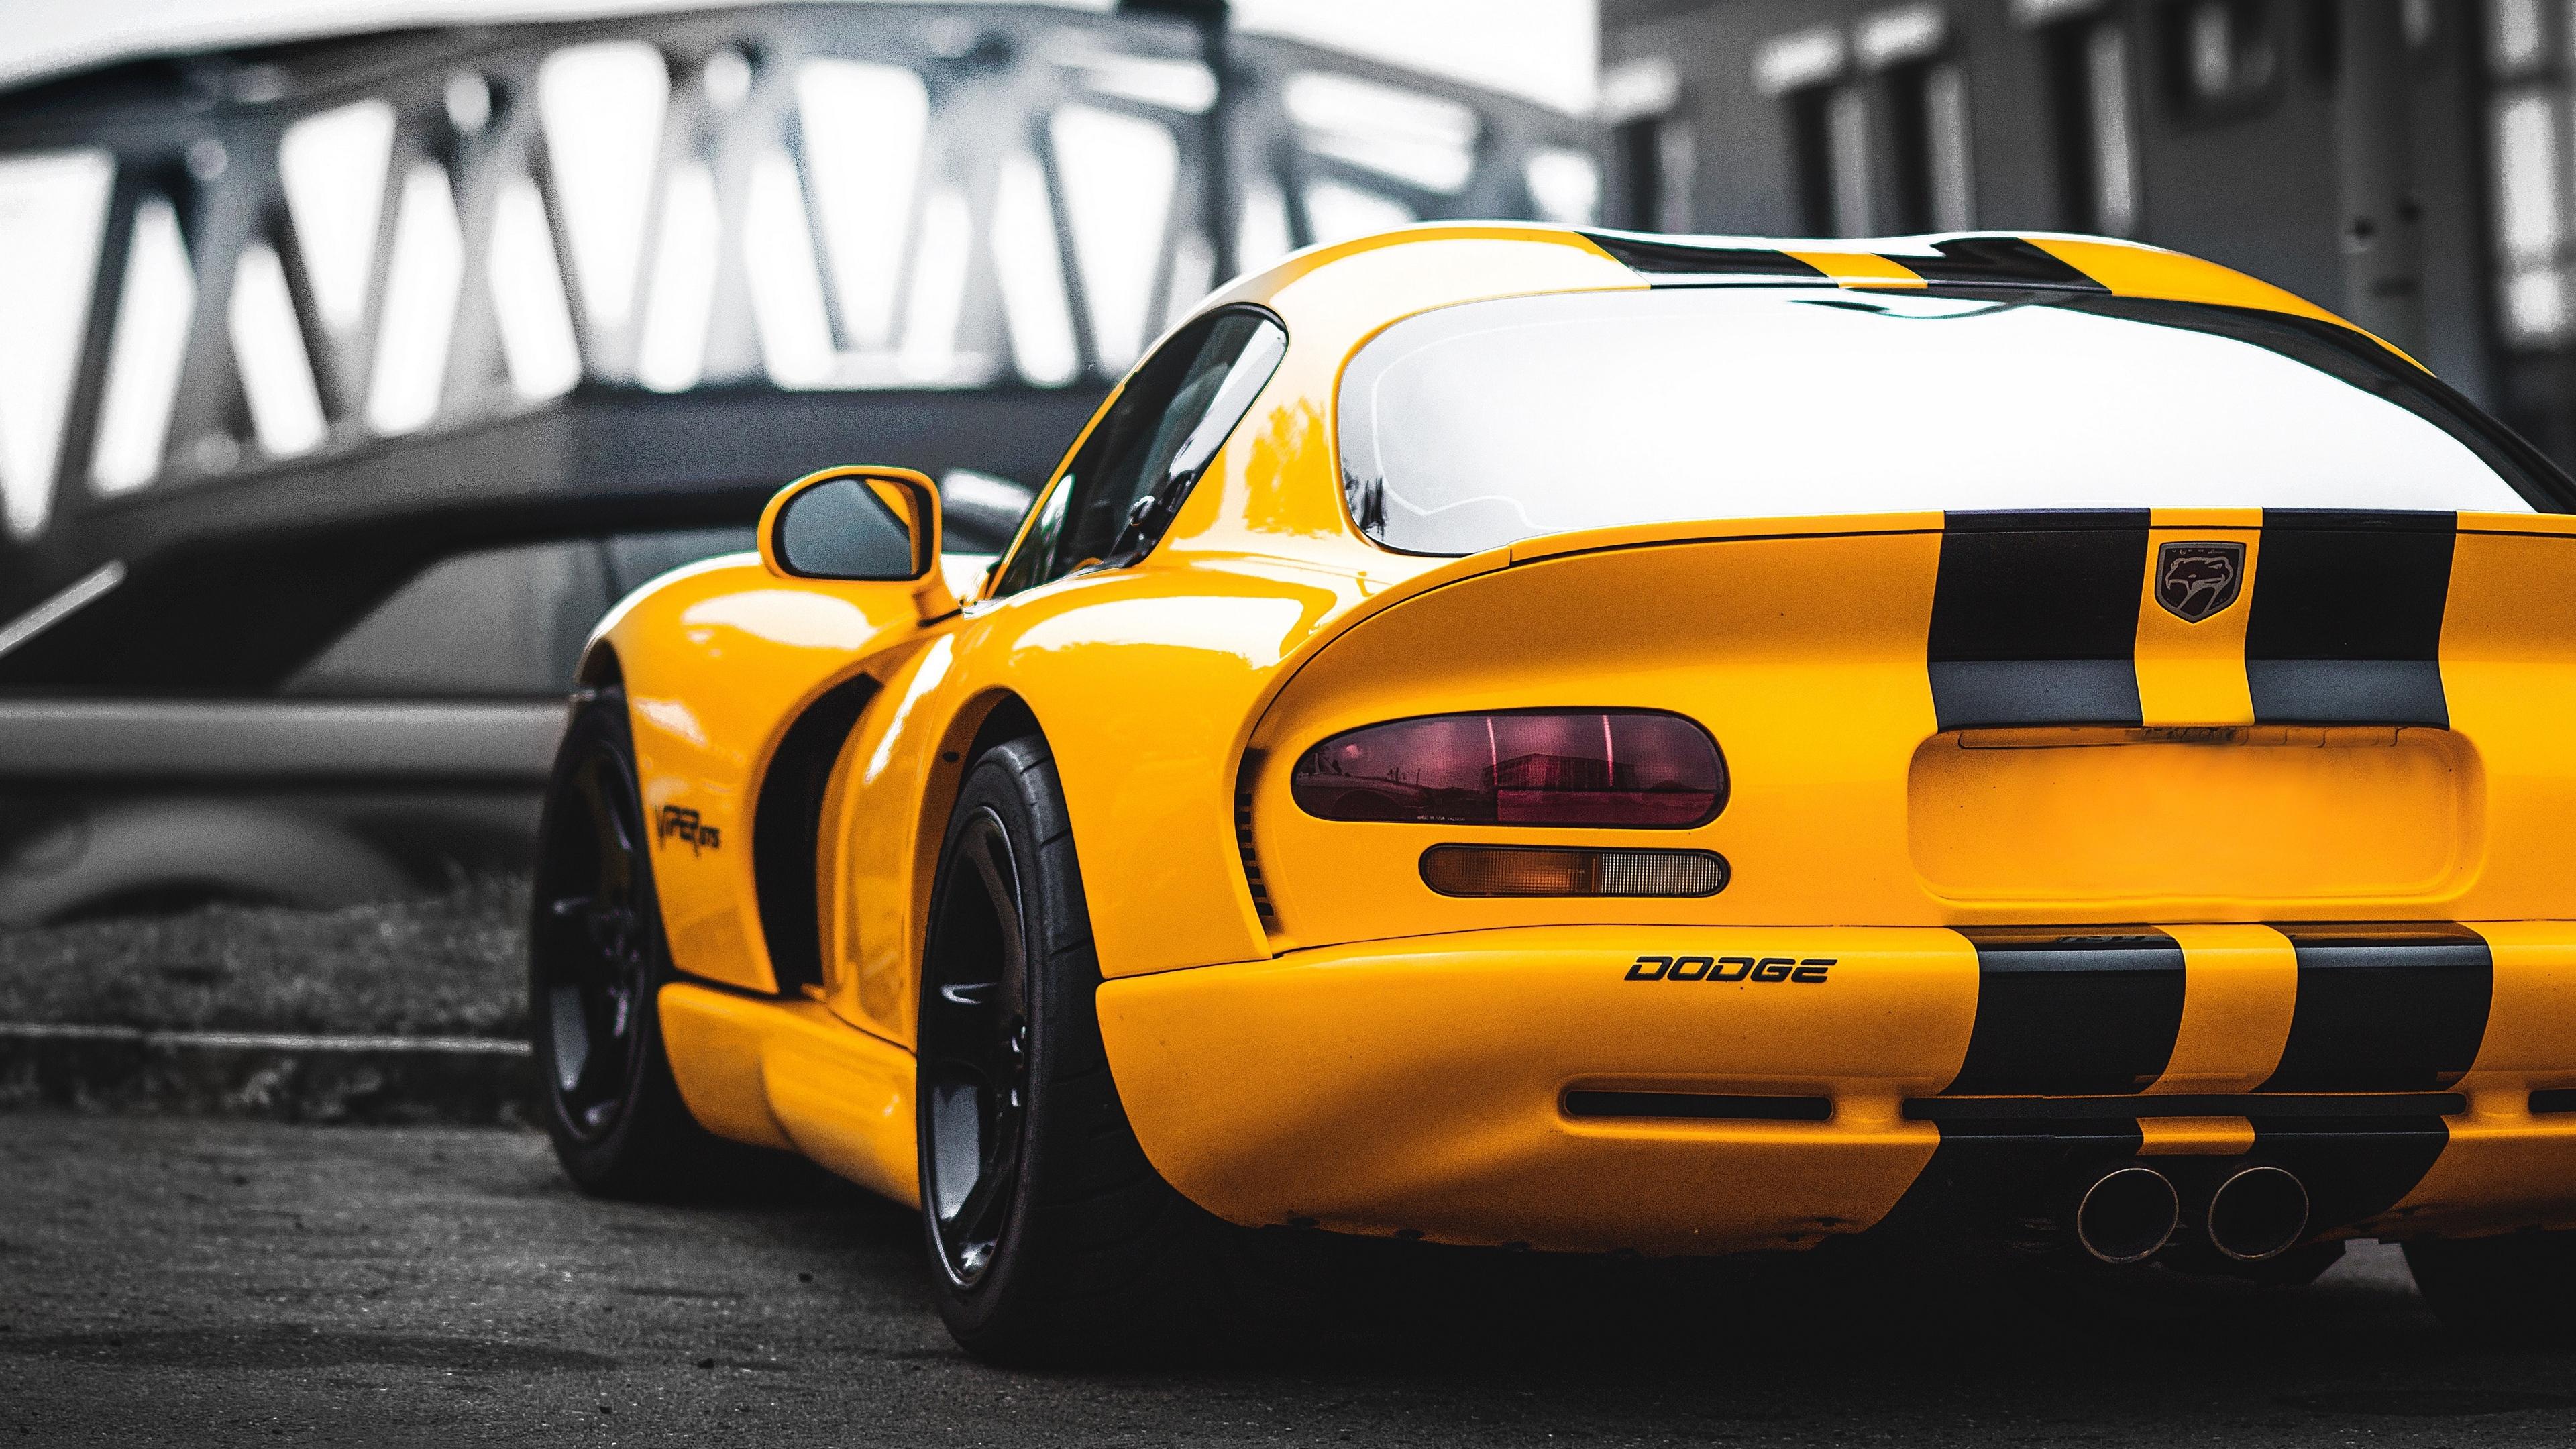 dodge viper rear 1539111003 - Dodge Viper Rear - yellow wallpapers, hd-wallpapers, dodge viper wallpapers, cars wallpapers, 4k-wallpapers